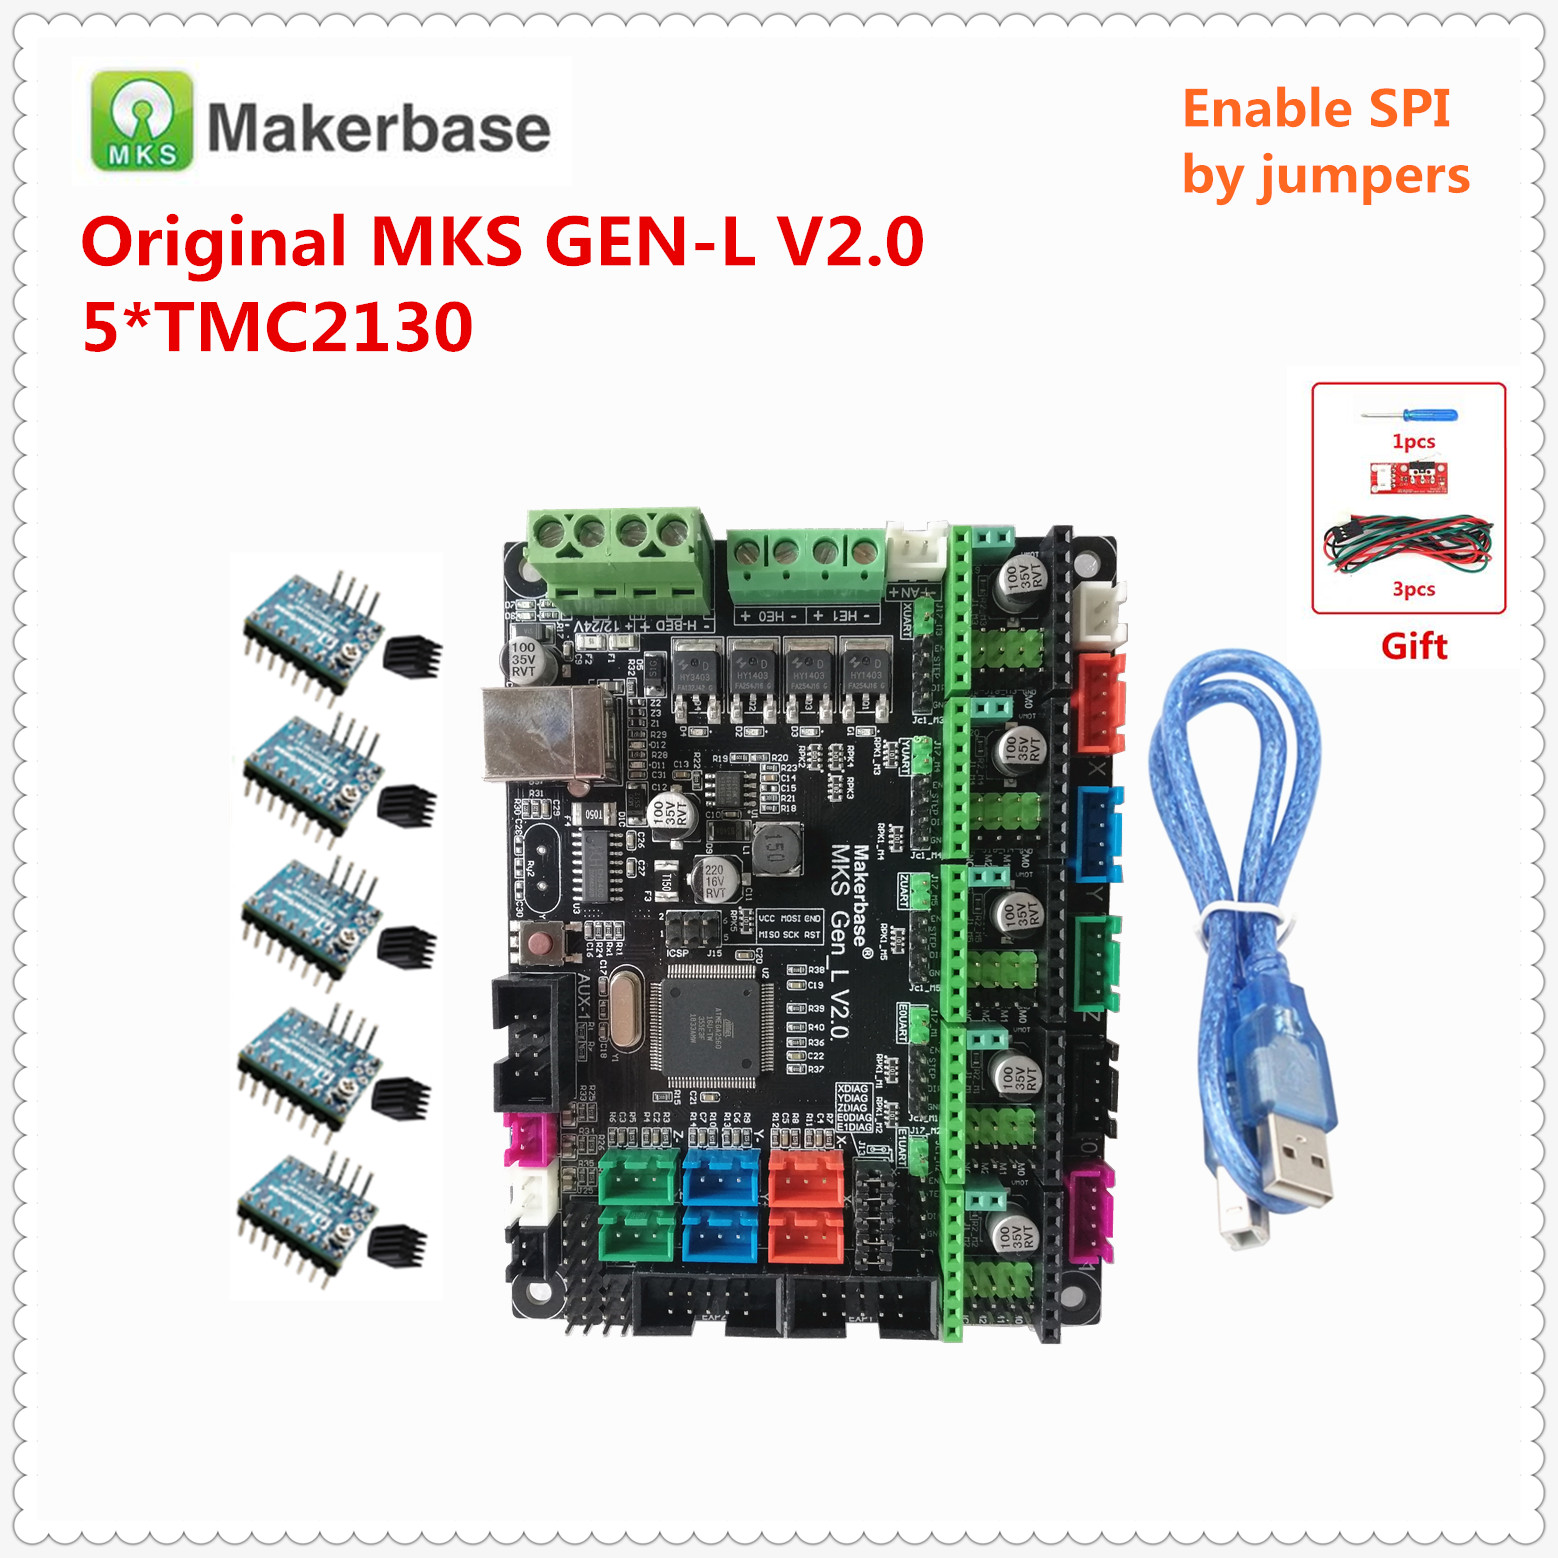 Makerbase Original MKS GEN L V2.0 3D Printer Spare Card Control Mainboard Support A4988 DRV8825 Tmc2130 Tmc2208 Lv8729 Tmc2130